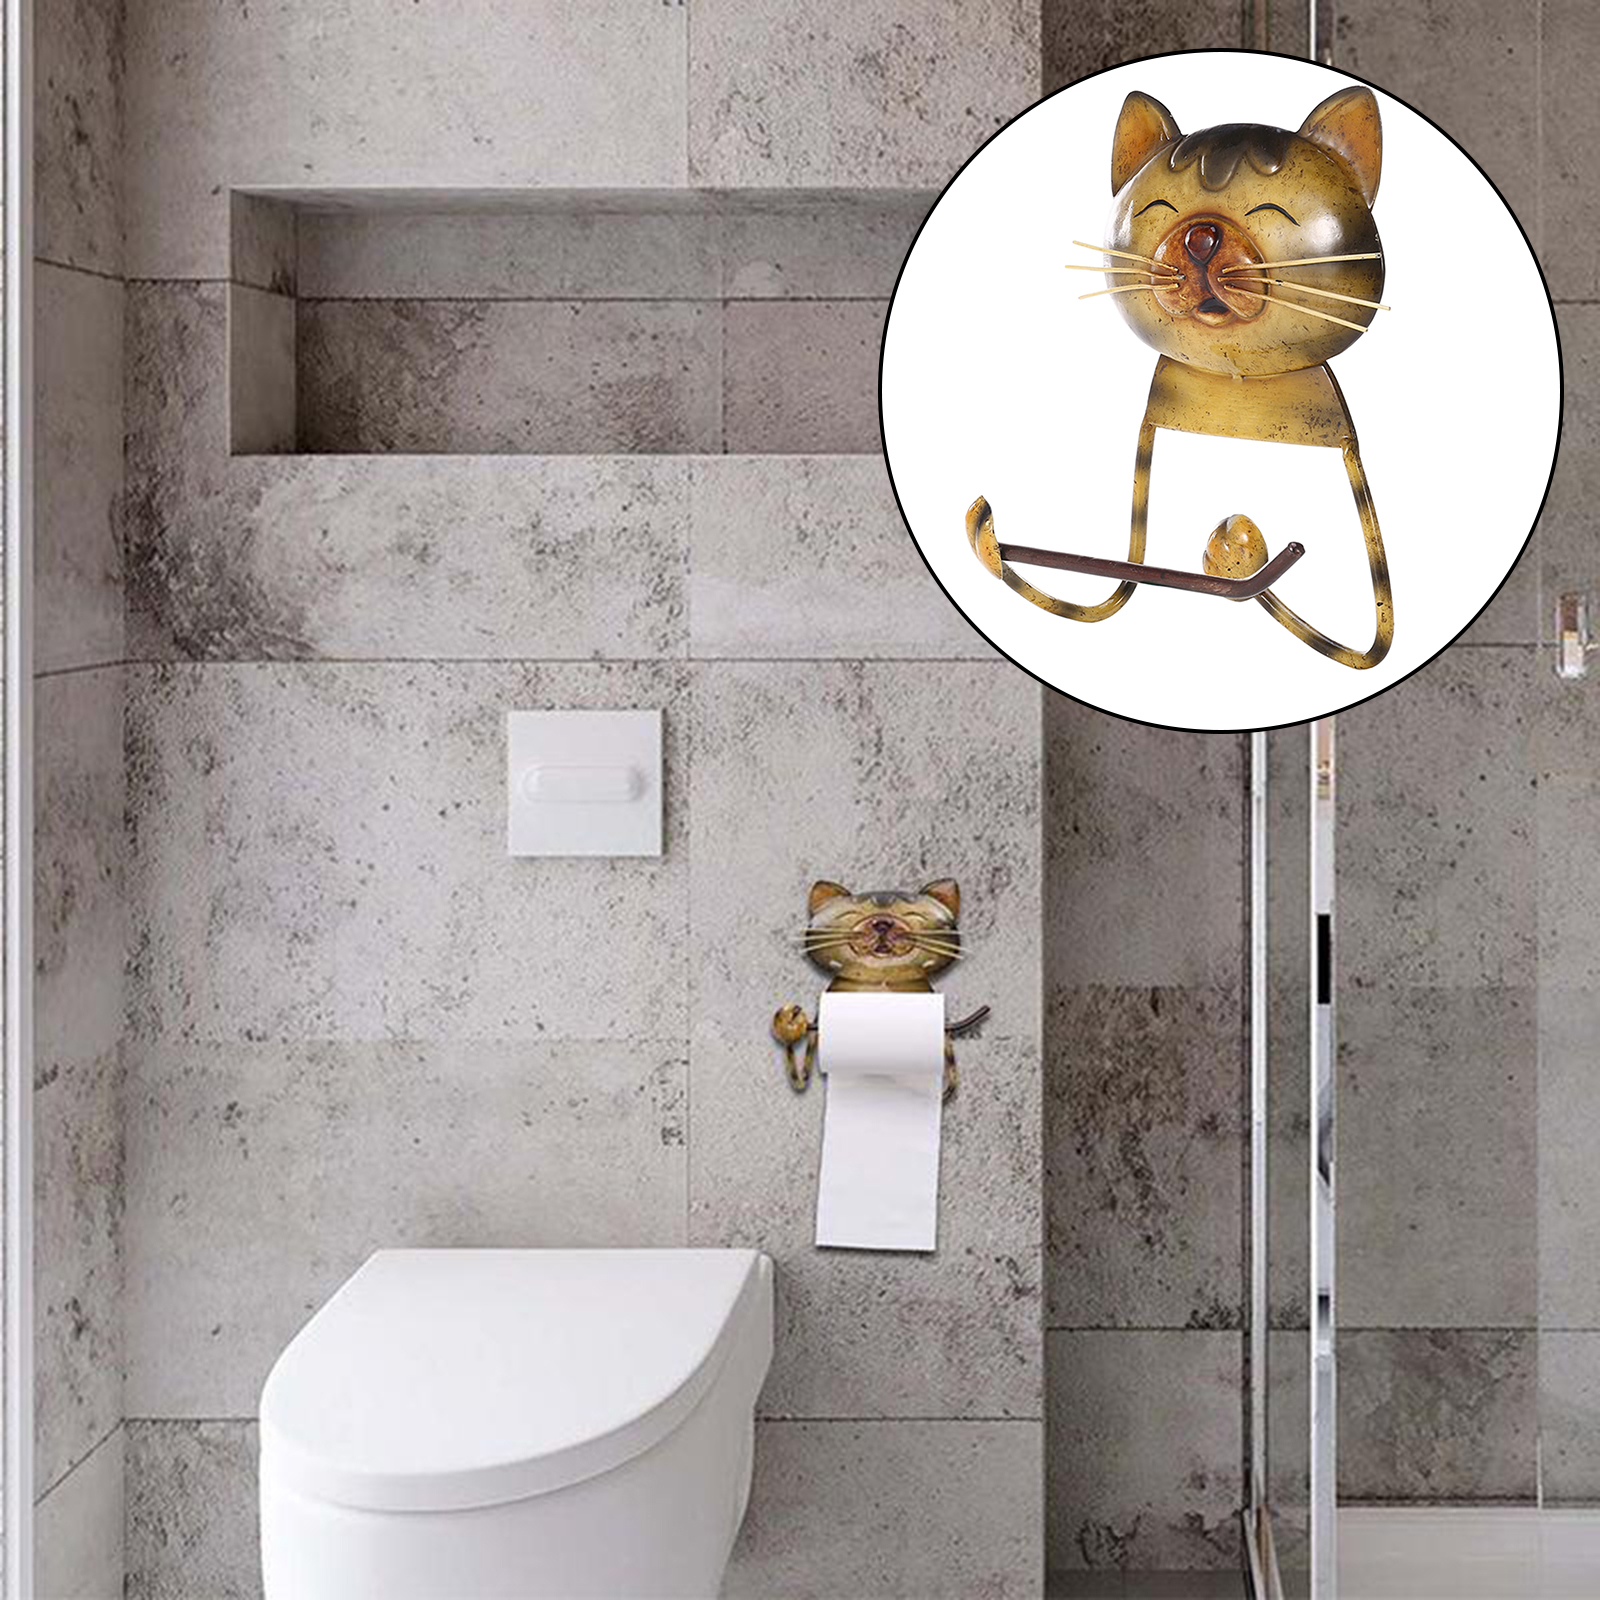 Wall Hanging Roll Paper Holder Home Kitchen Tissue Roll Paper Dispenser Rack Bathroom Towel Holders